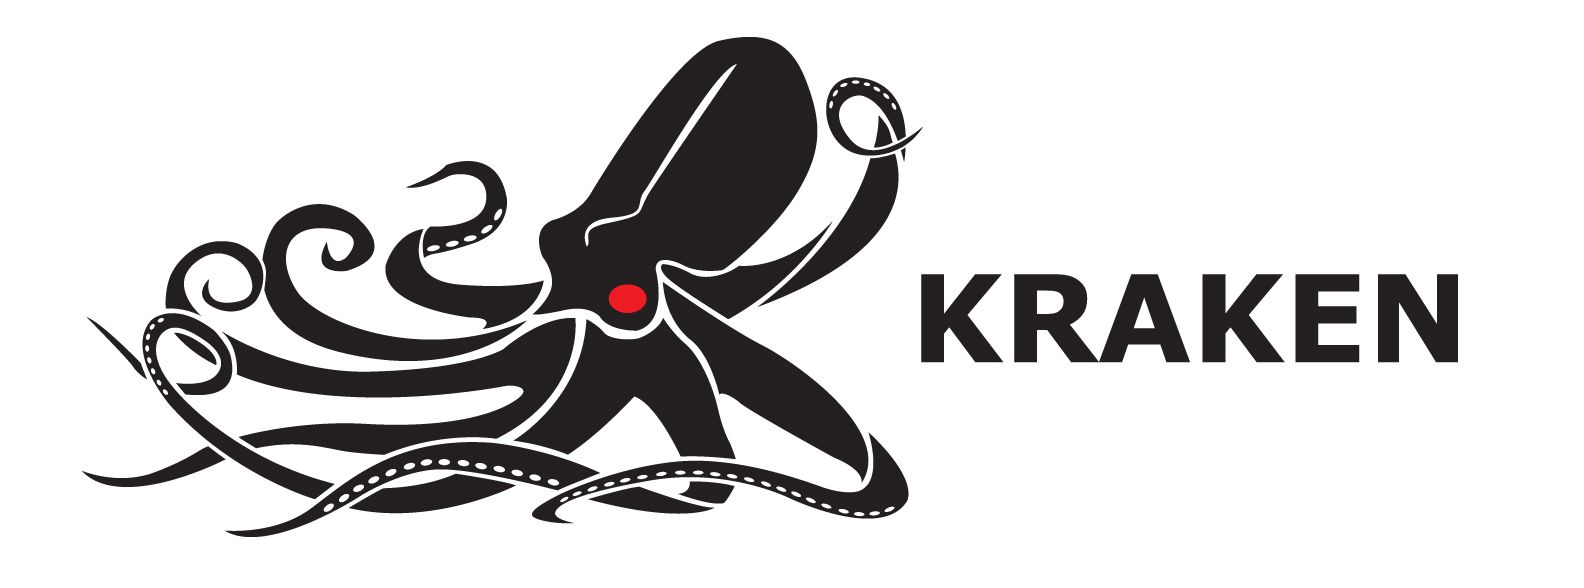 Kraken Robotic Systems Inc